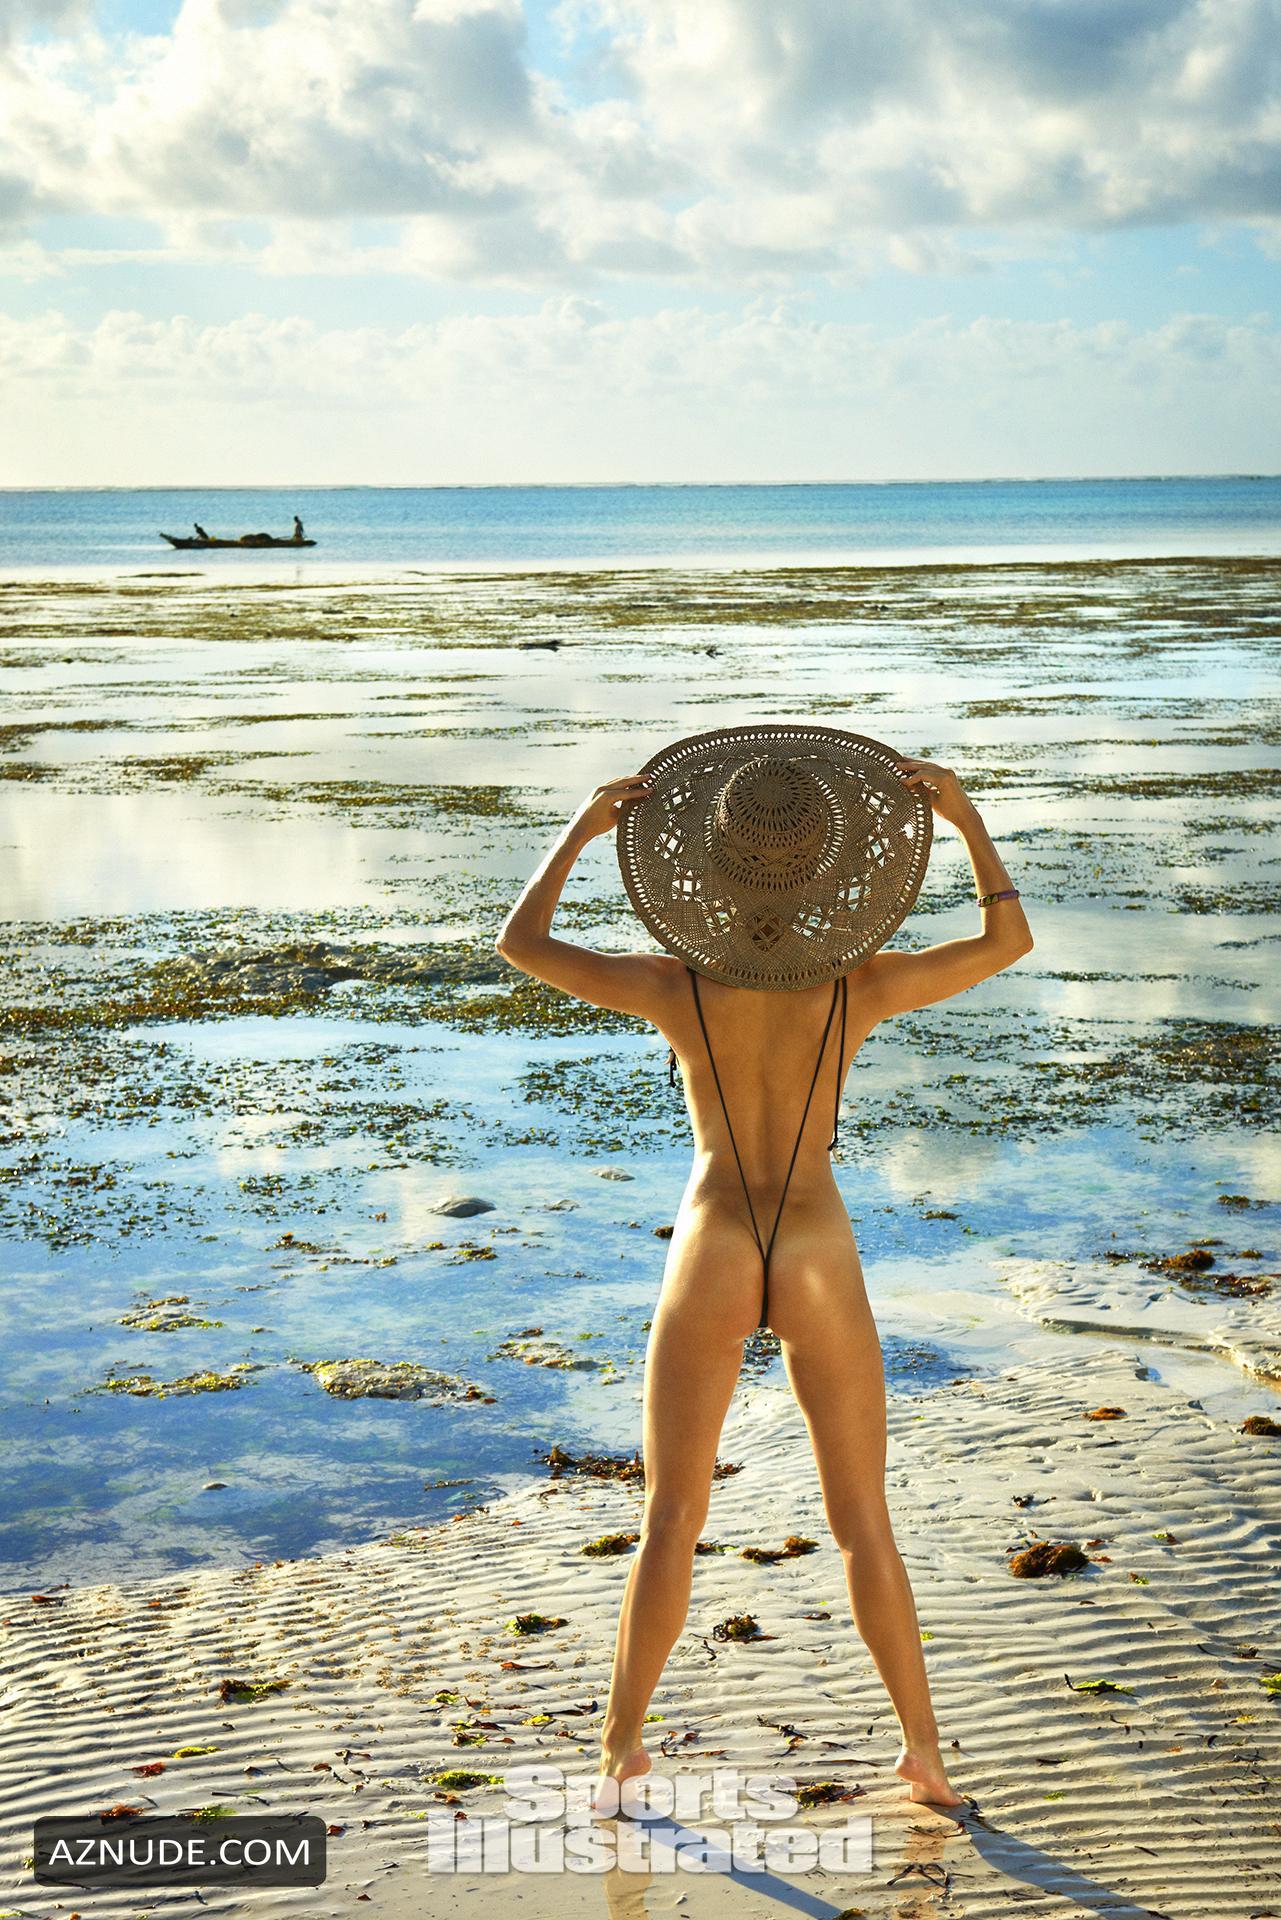 Finest Sports Illustrated Nude Swimsuit Jpg